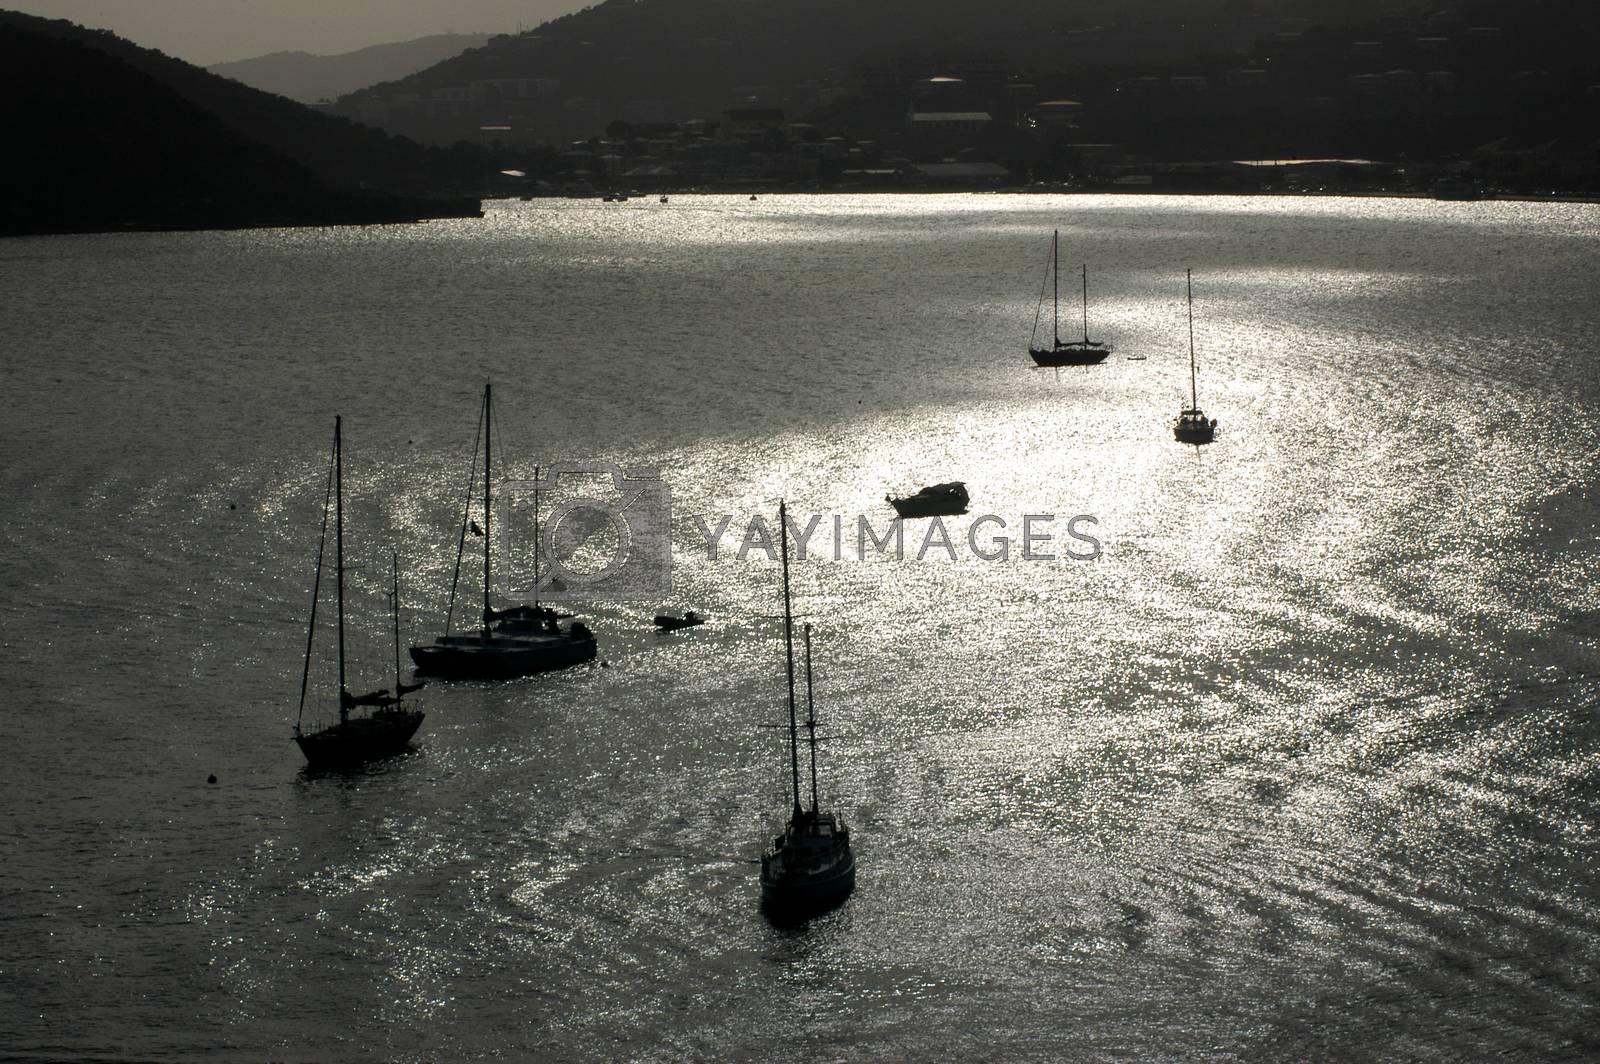 Sail boats at sunset by Peric